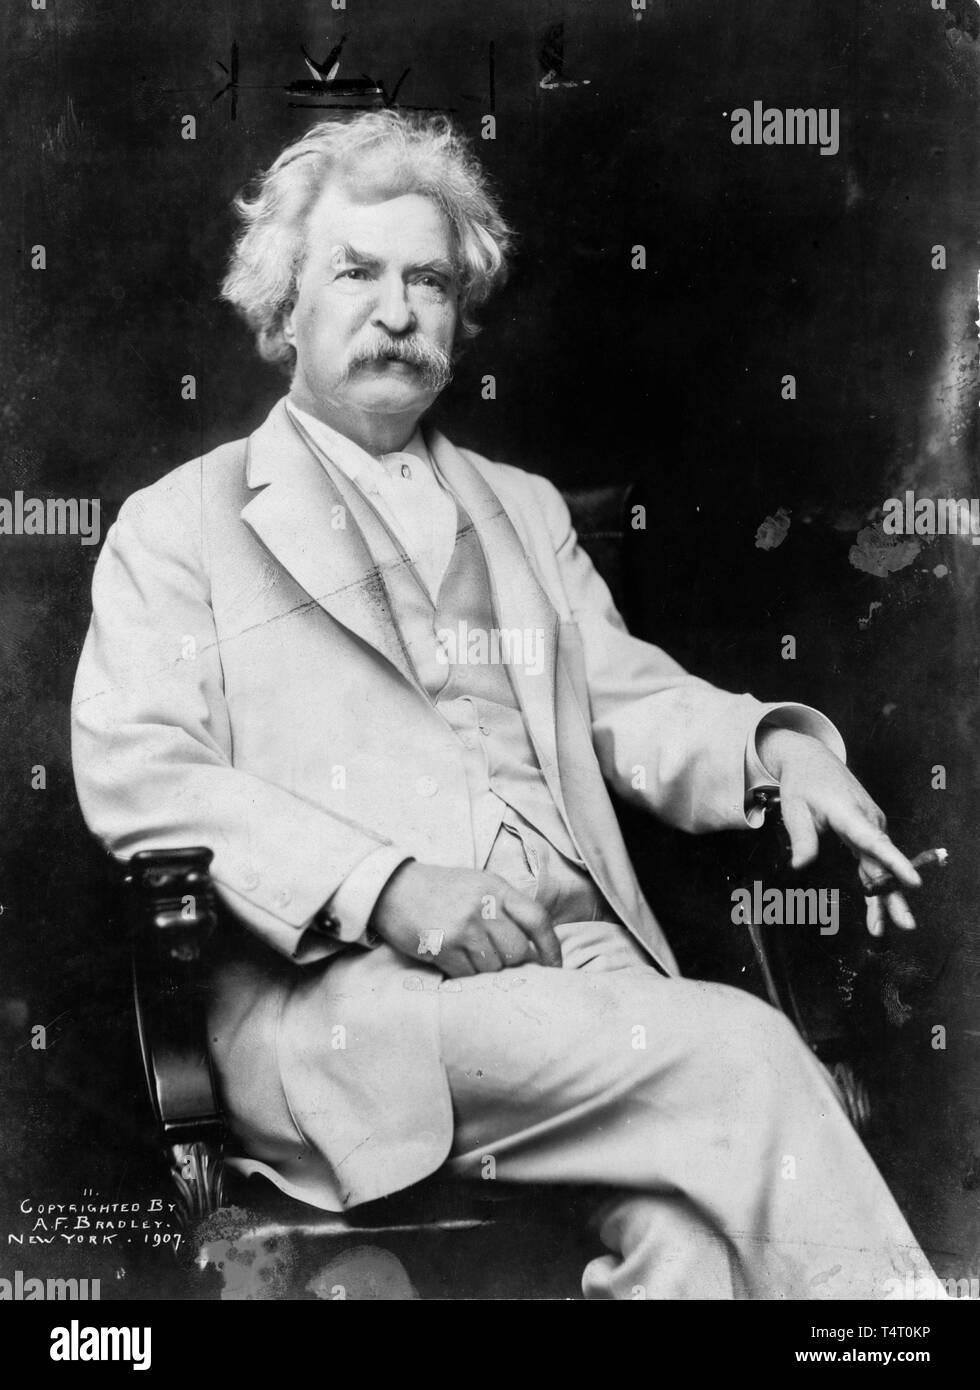 Mark Twain (1835-1910), portrait photograph by A.F. Bradley, 1907 Stock Photo